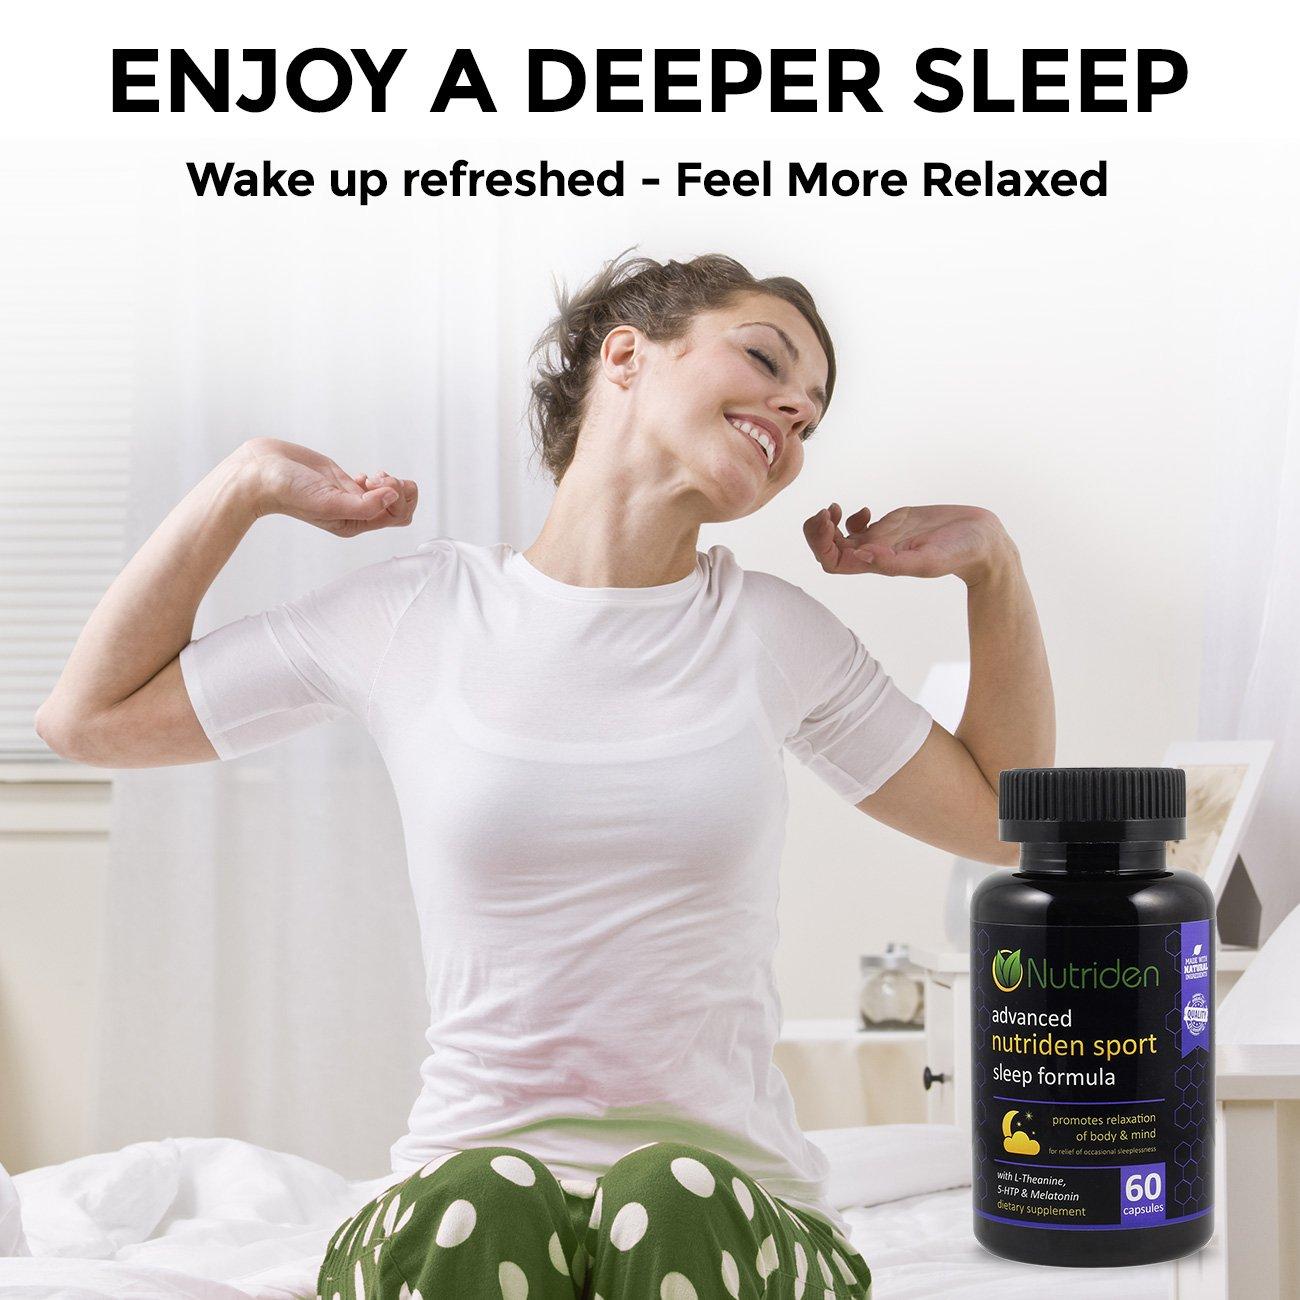 Nutriden Sport Advanced Sleep Aid - All Natural Sedative Effects from Melatonin, Magnesium, L-Theanine, 5-HTP & GABA - 100% Risk Free Guarantee (60 Capsules)